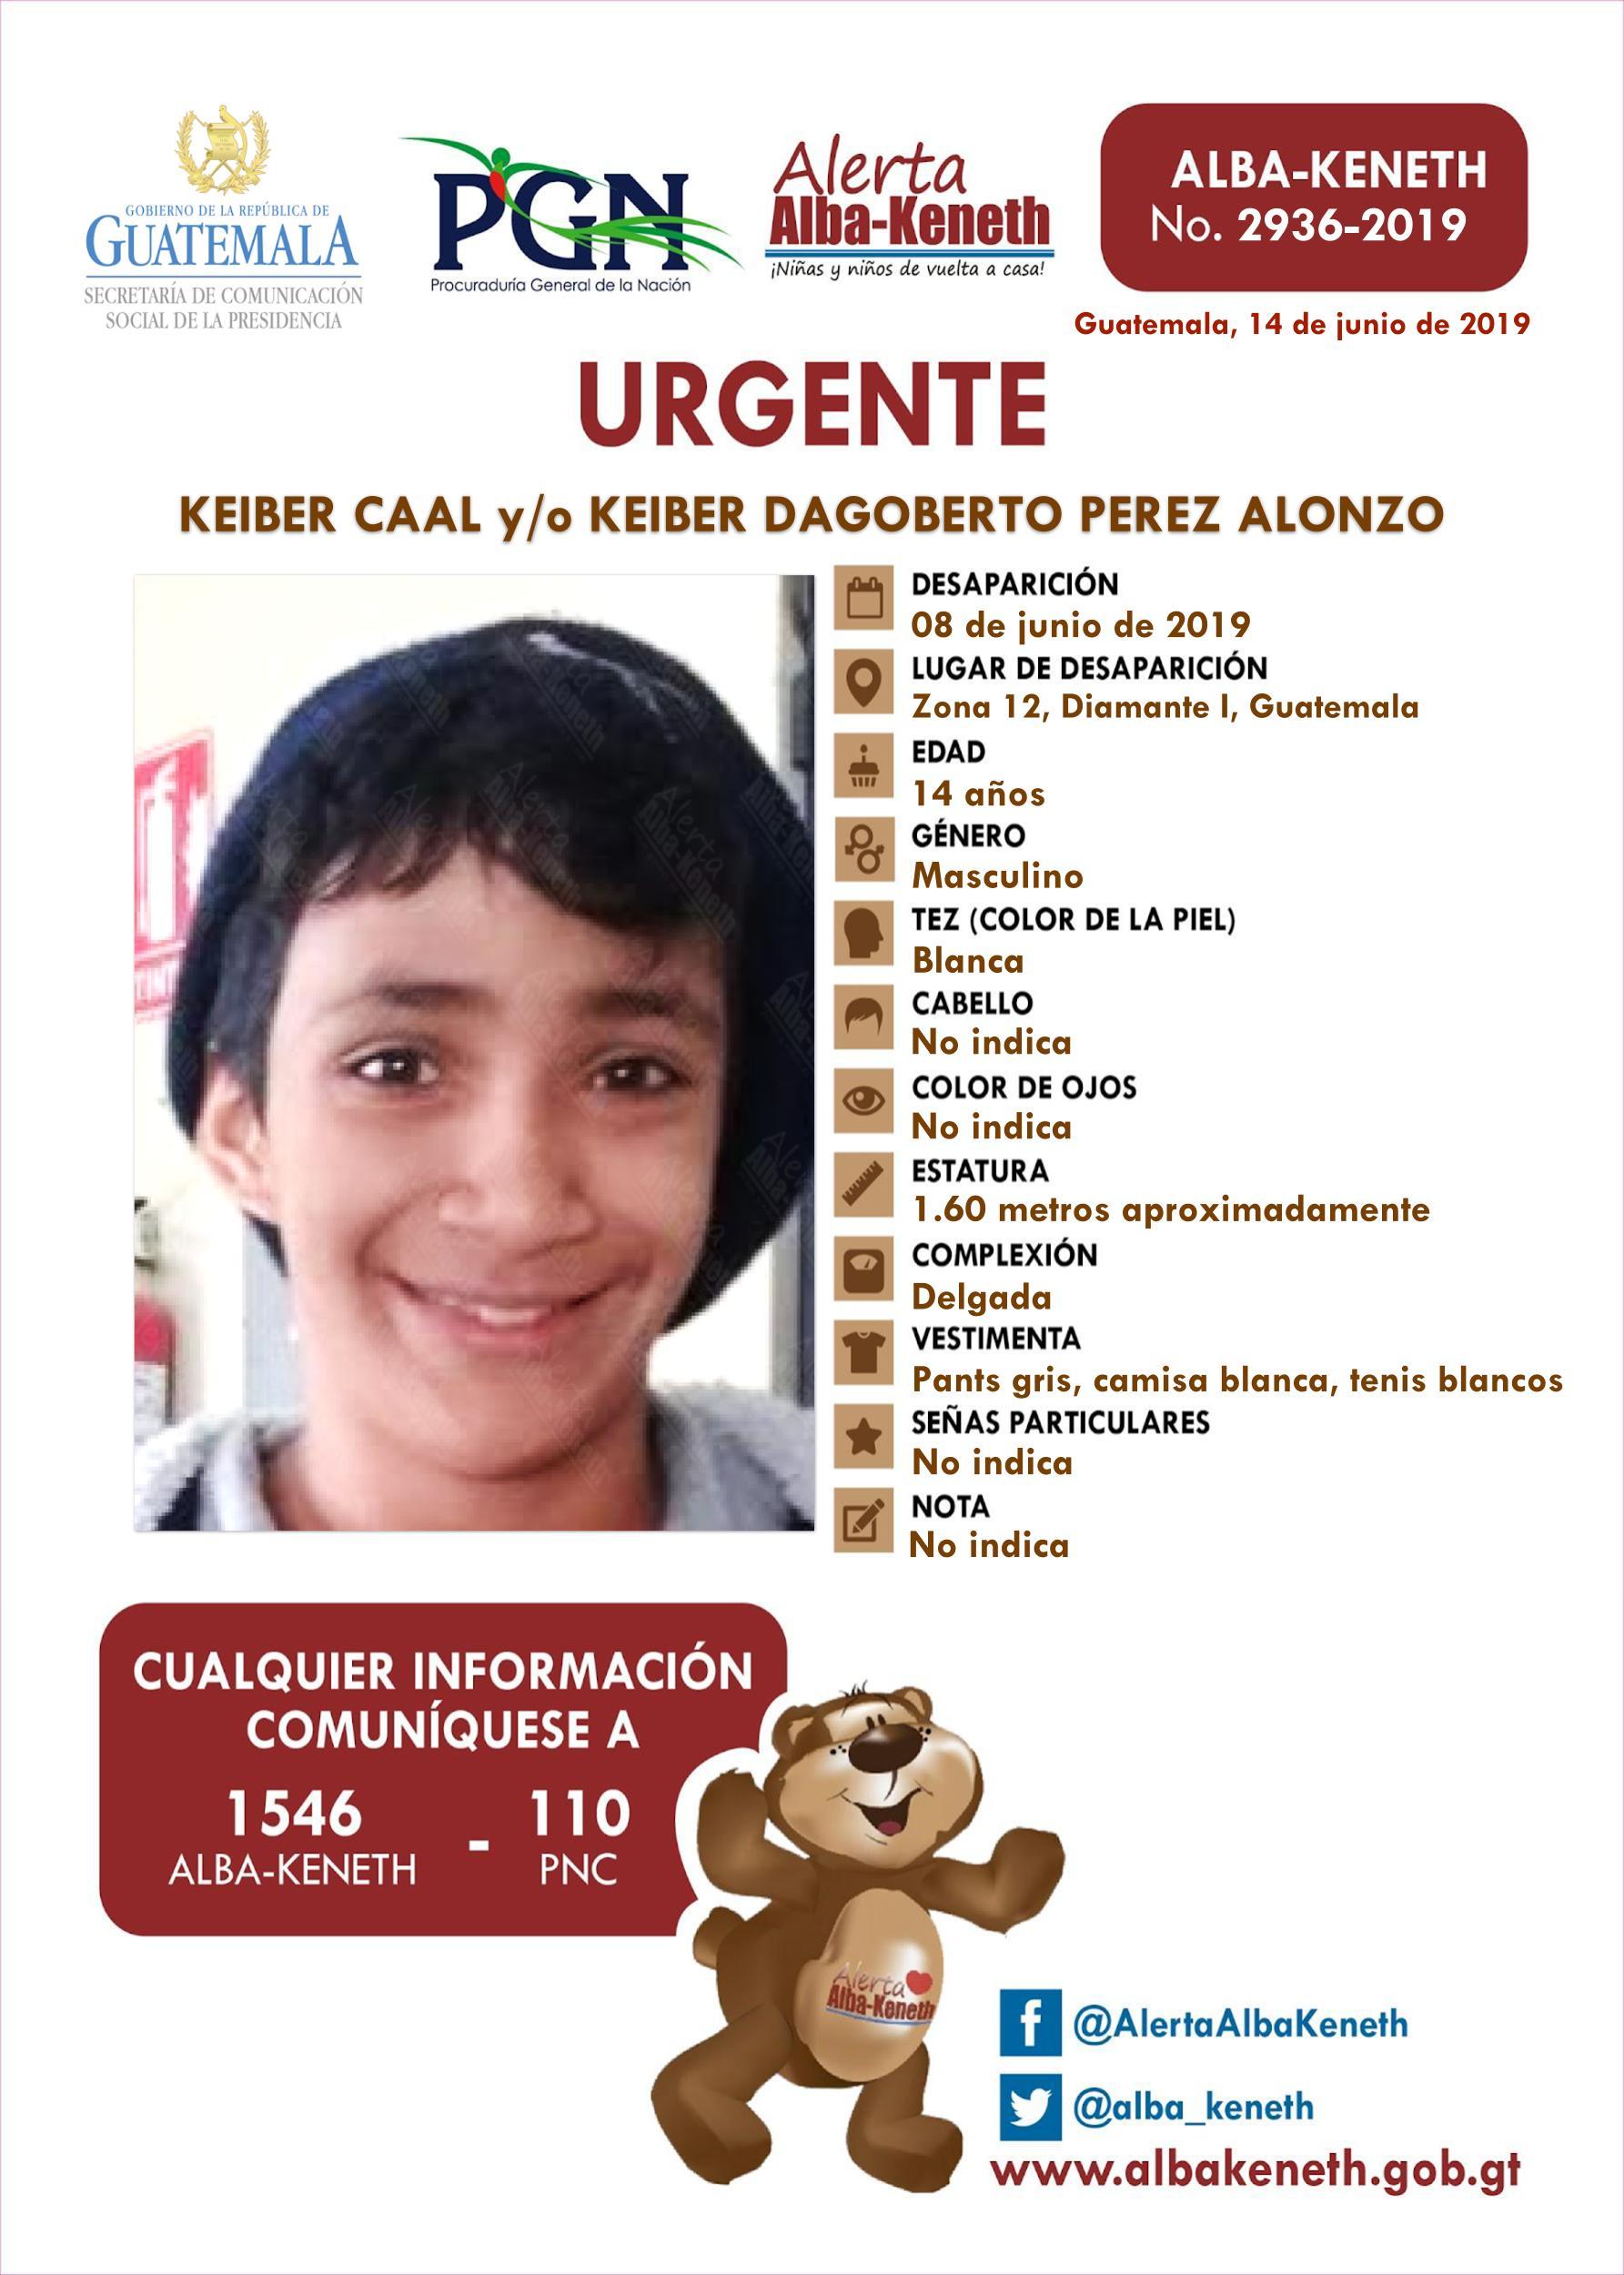 Keiber Caal y/o Keiber Dagoberto Perez Alonzo